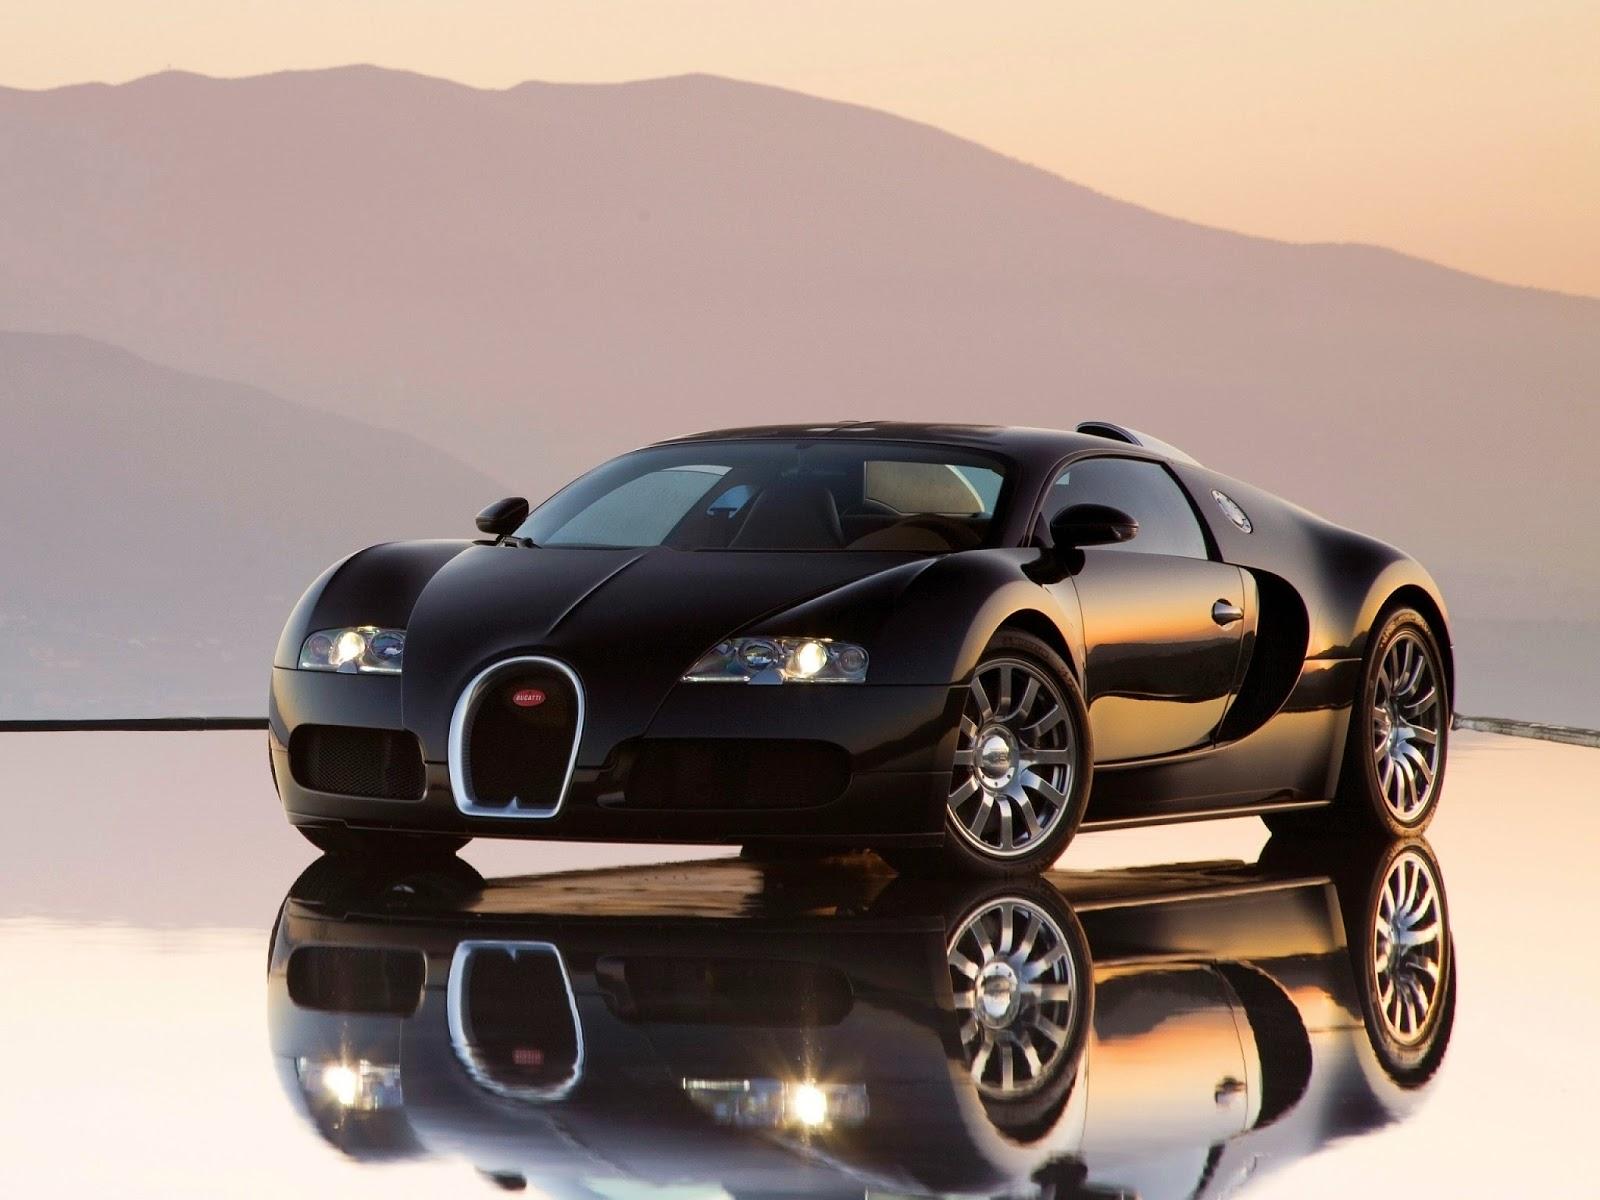 Beautiful Bugatti Veyron Www Topsimages Com